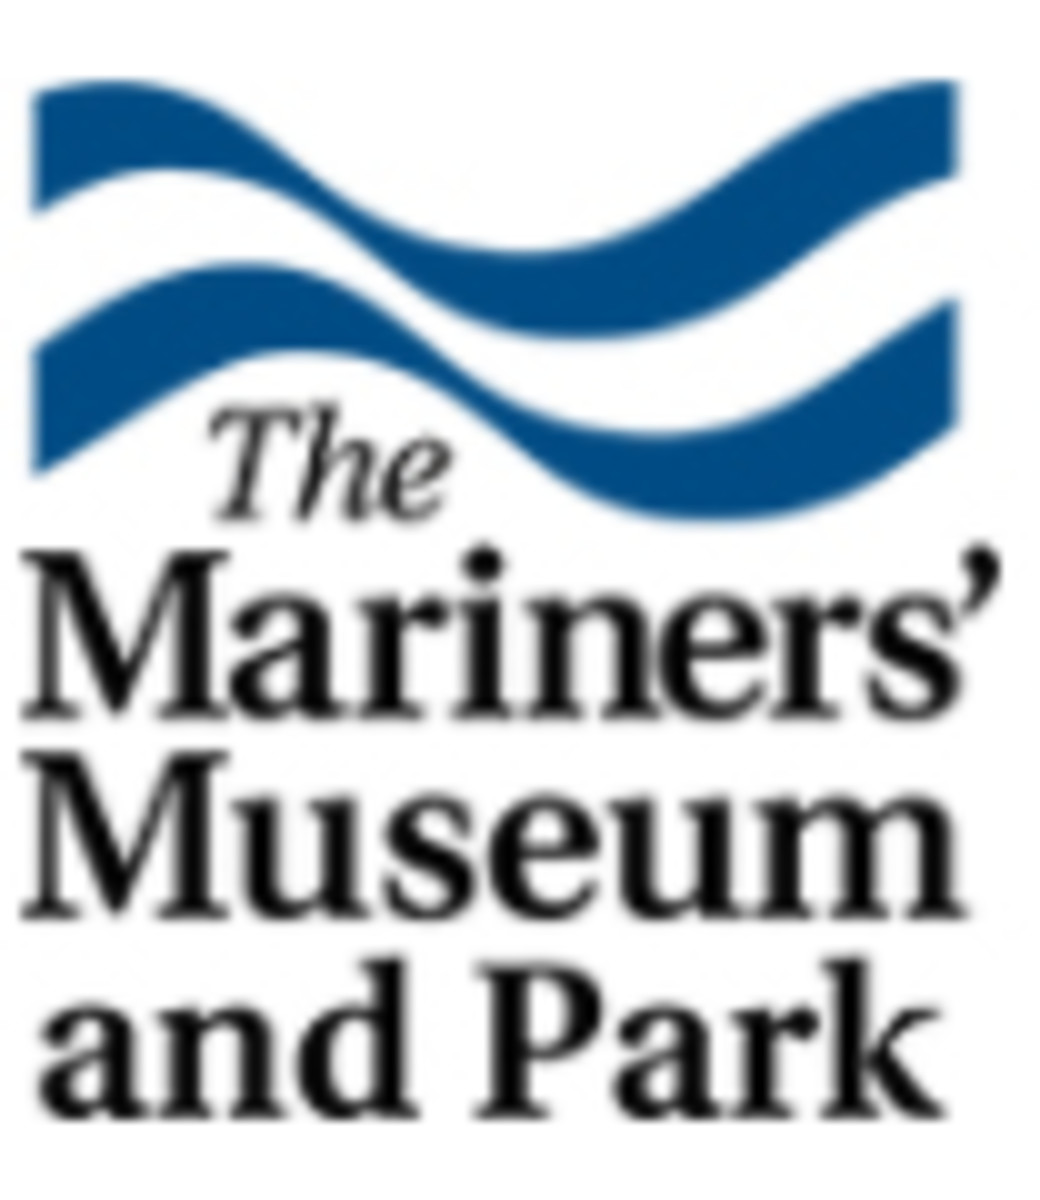 Mariners Museuma nd Park